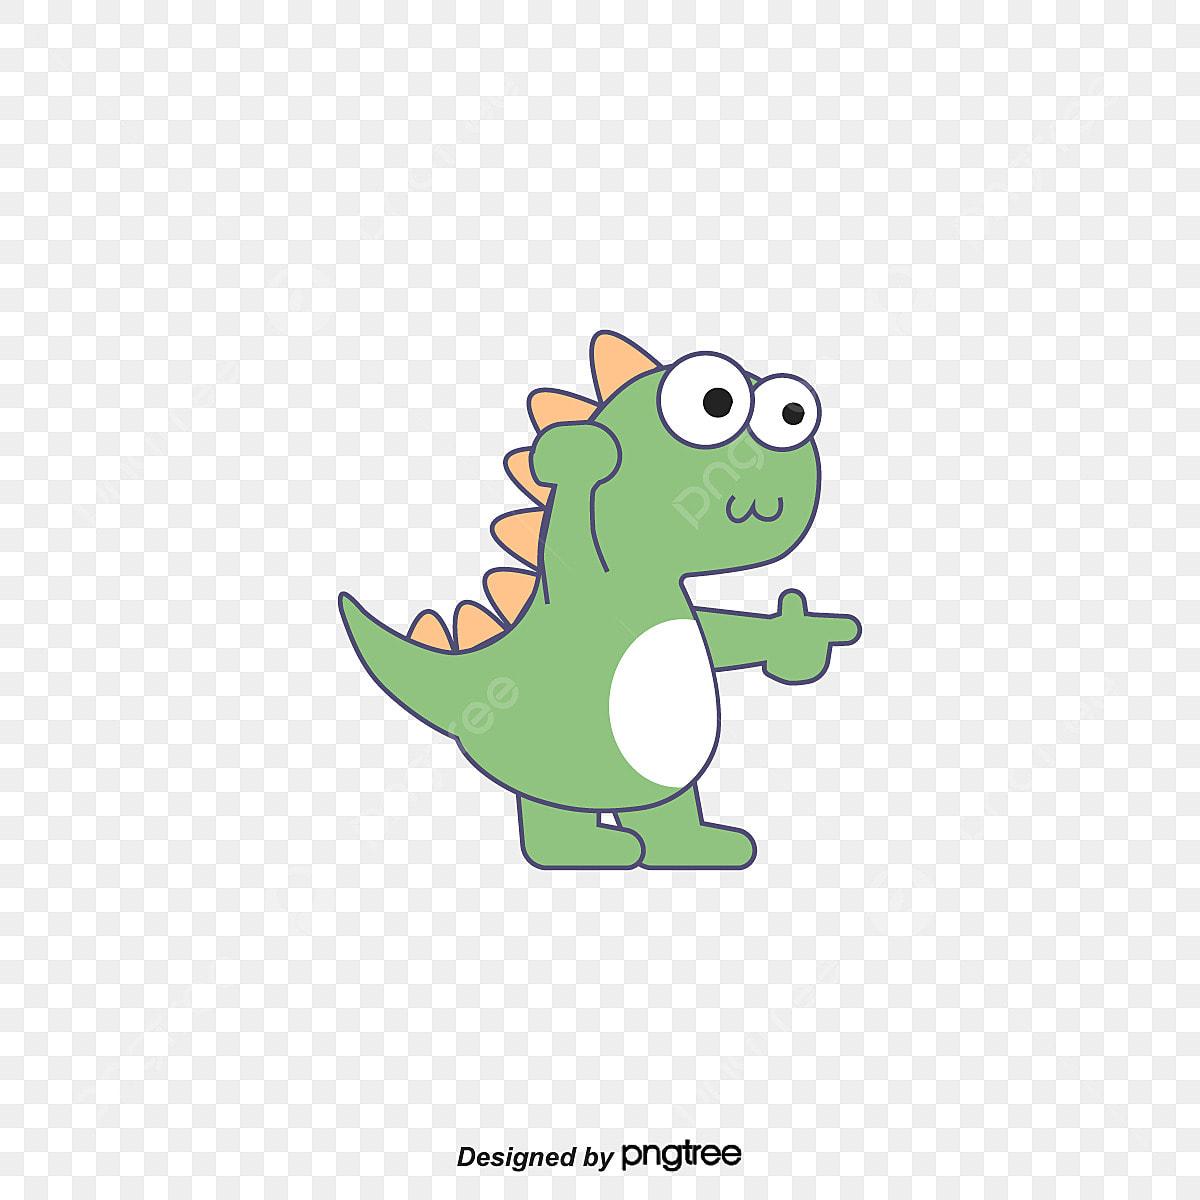 91+ Gambar Kartun Binatang Buaya HD Terbaru